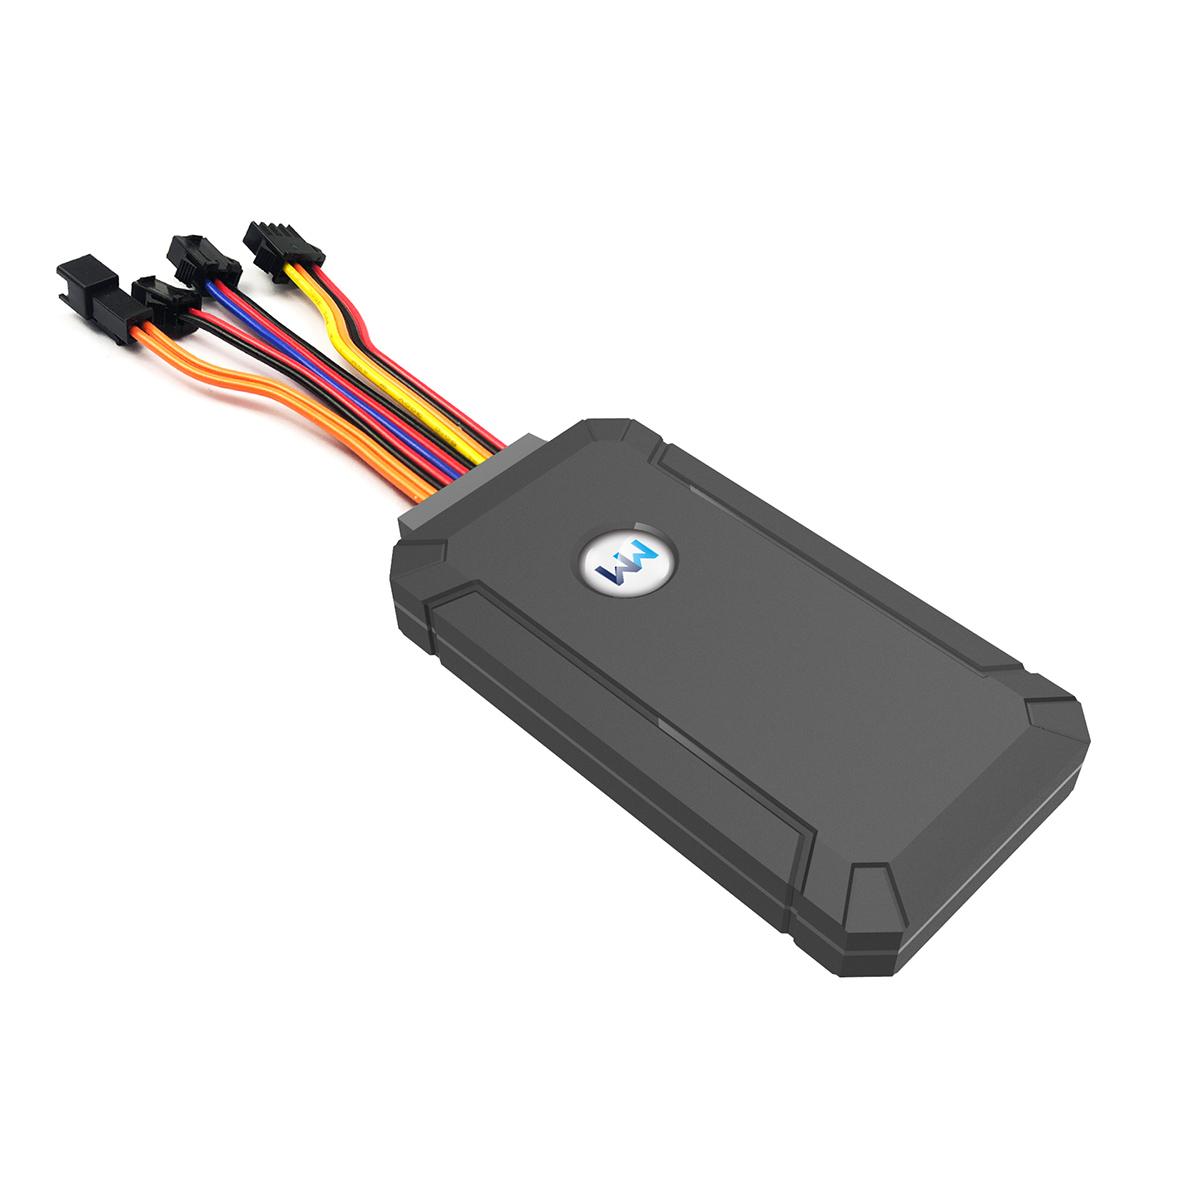 gps tracker 3G mobil paket 1 tahun